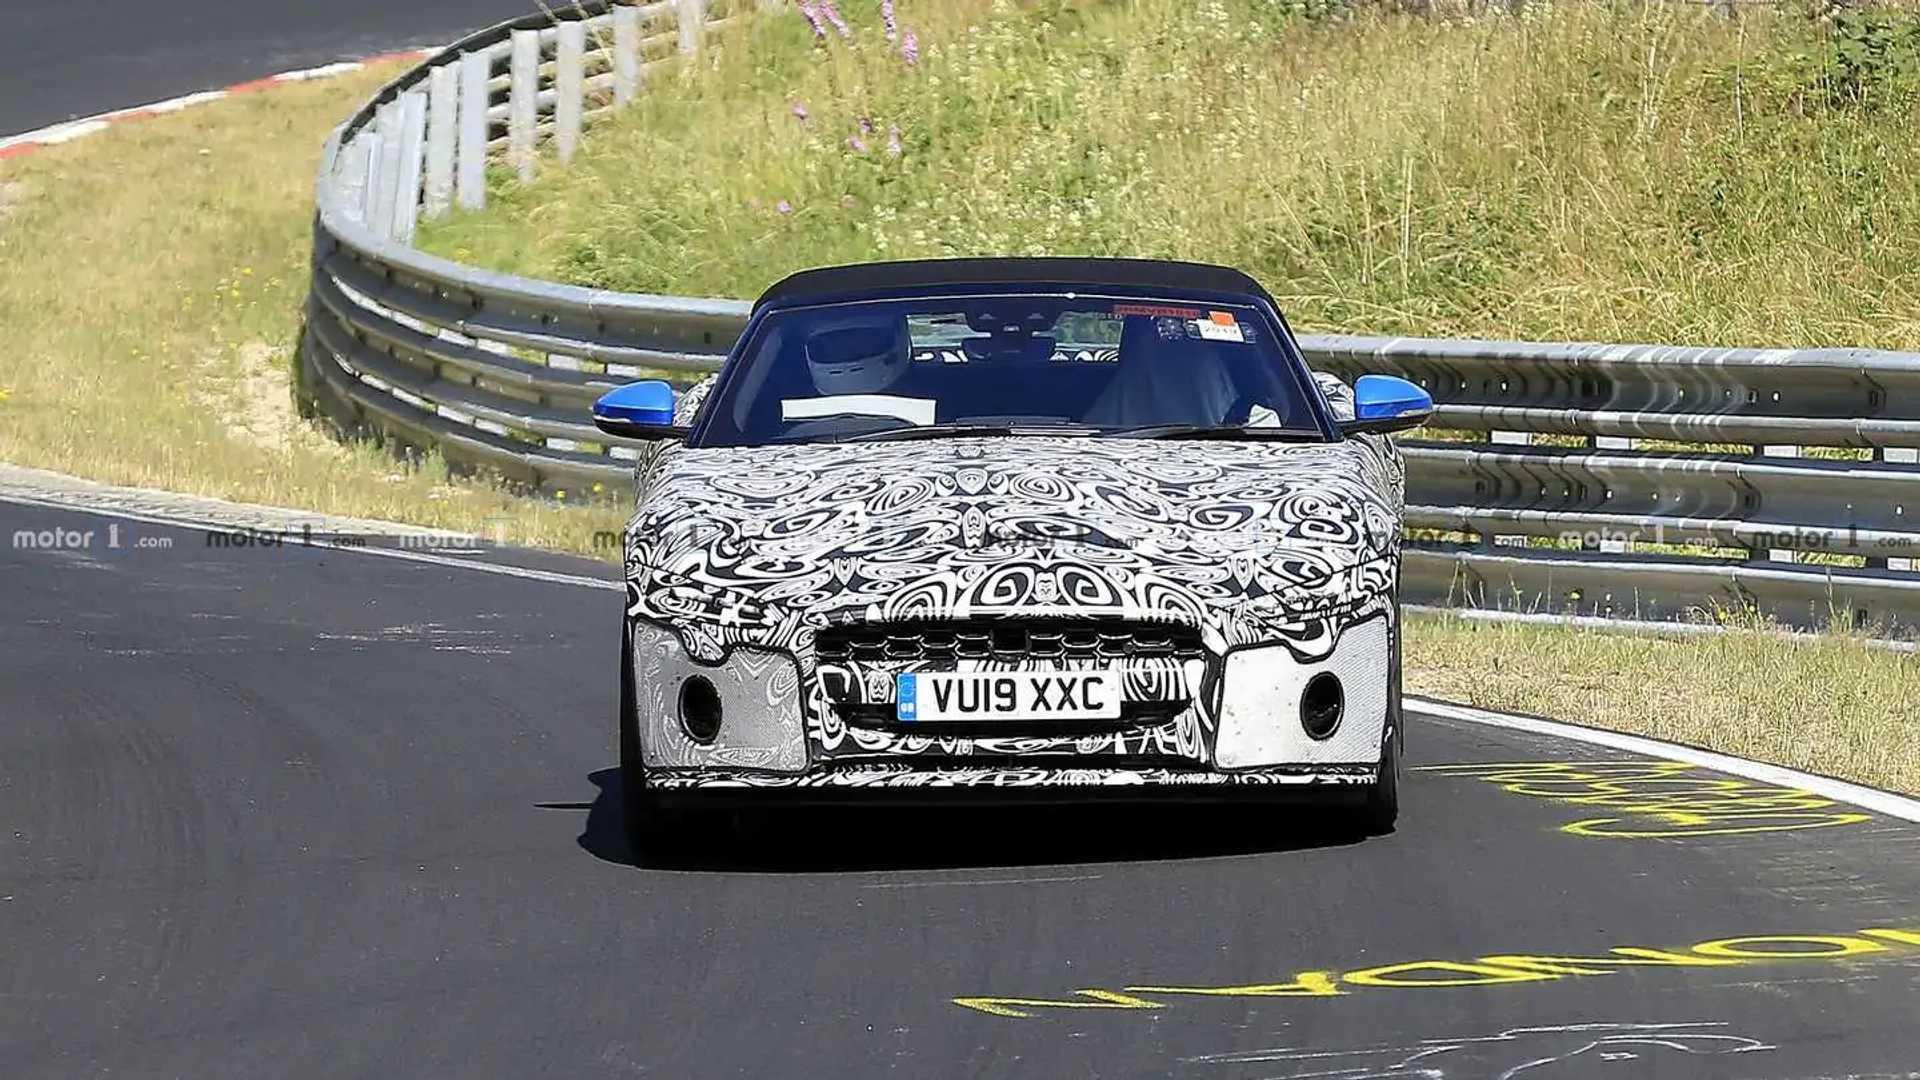 Facelifted Jaguar F-Type Coupe, конвертируемый шпион [ОБНОВЛЕНИЕ]